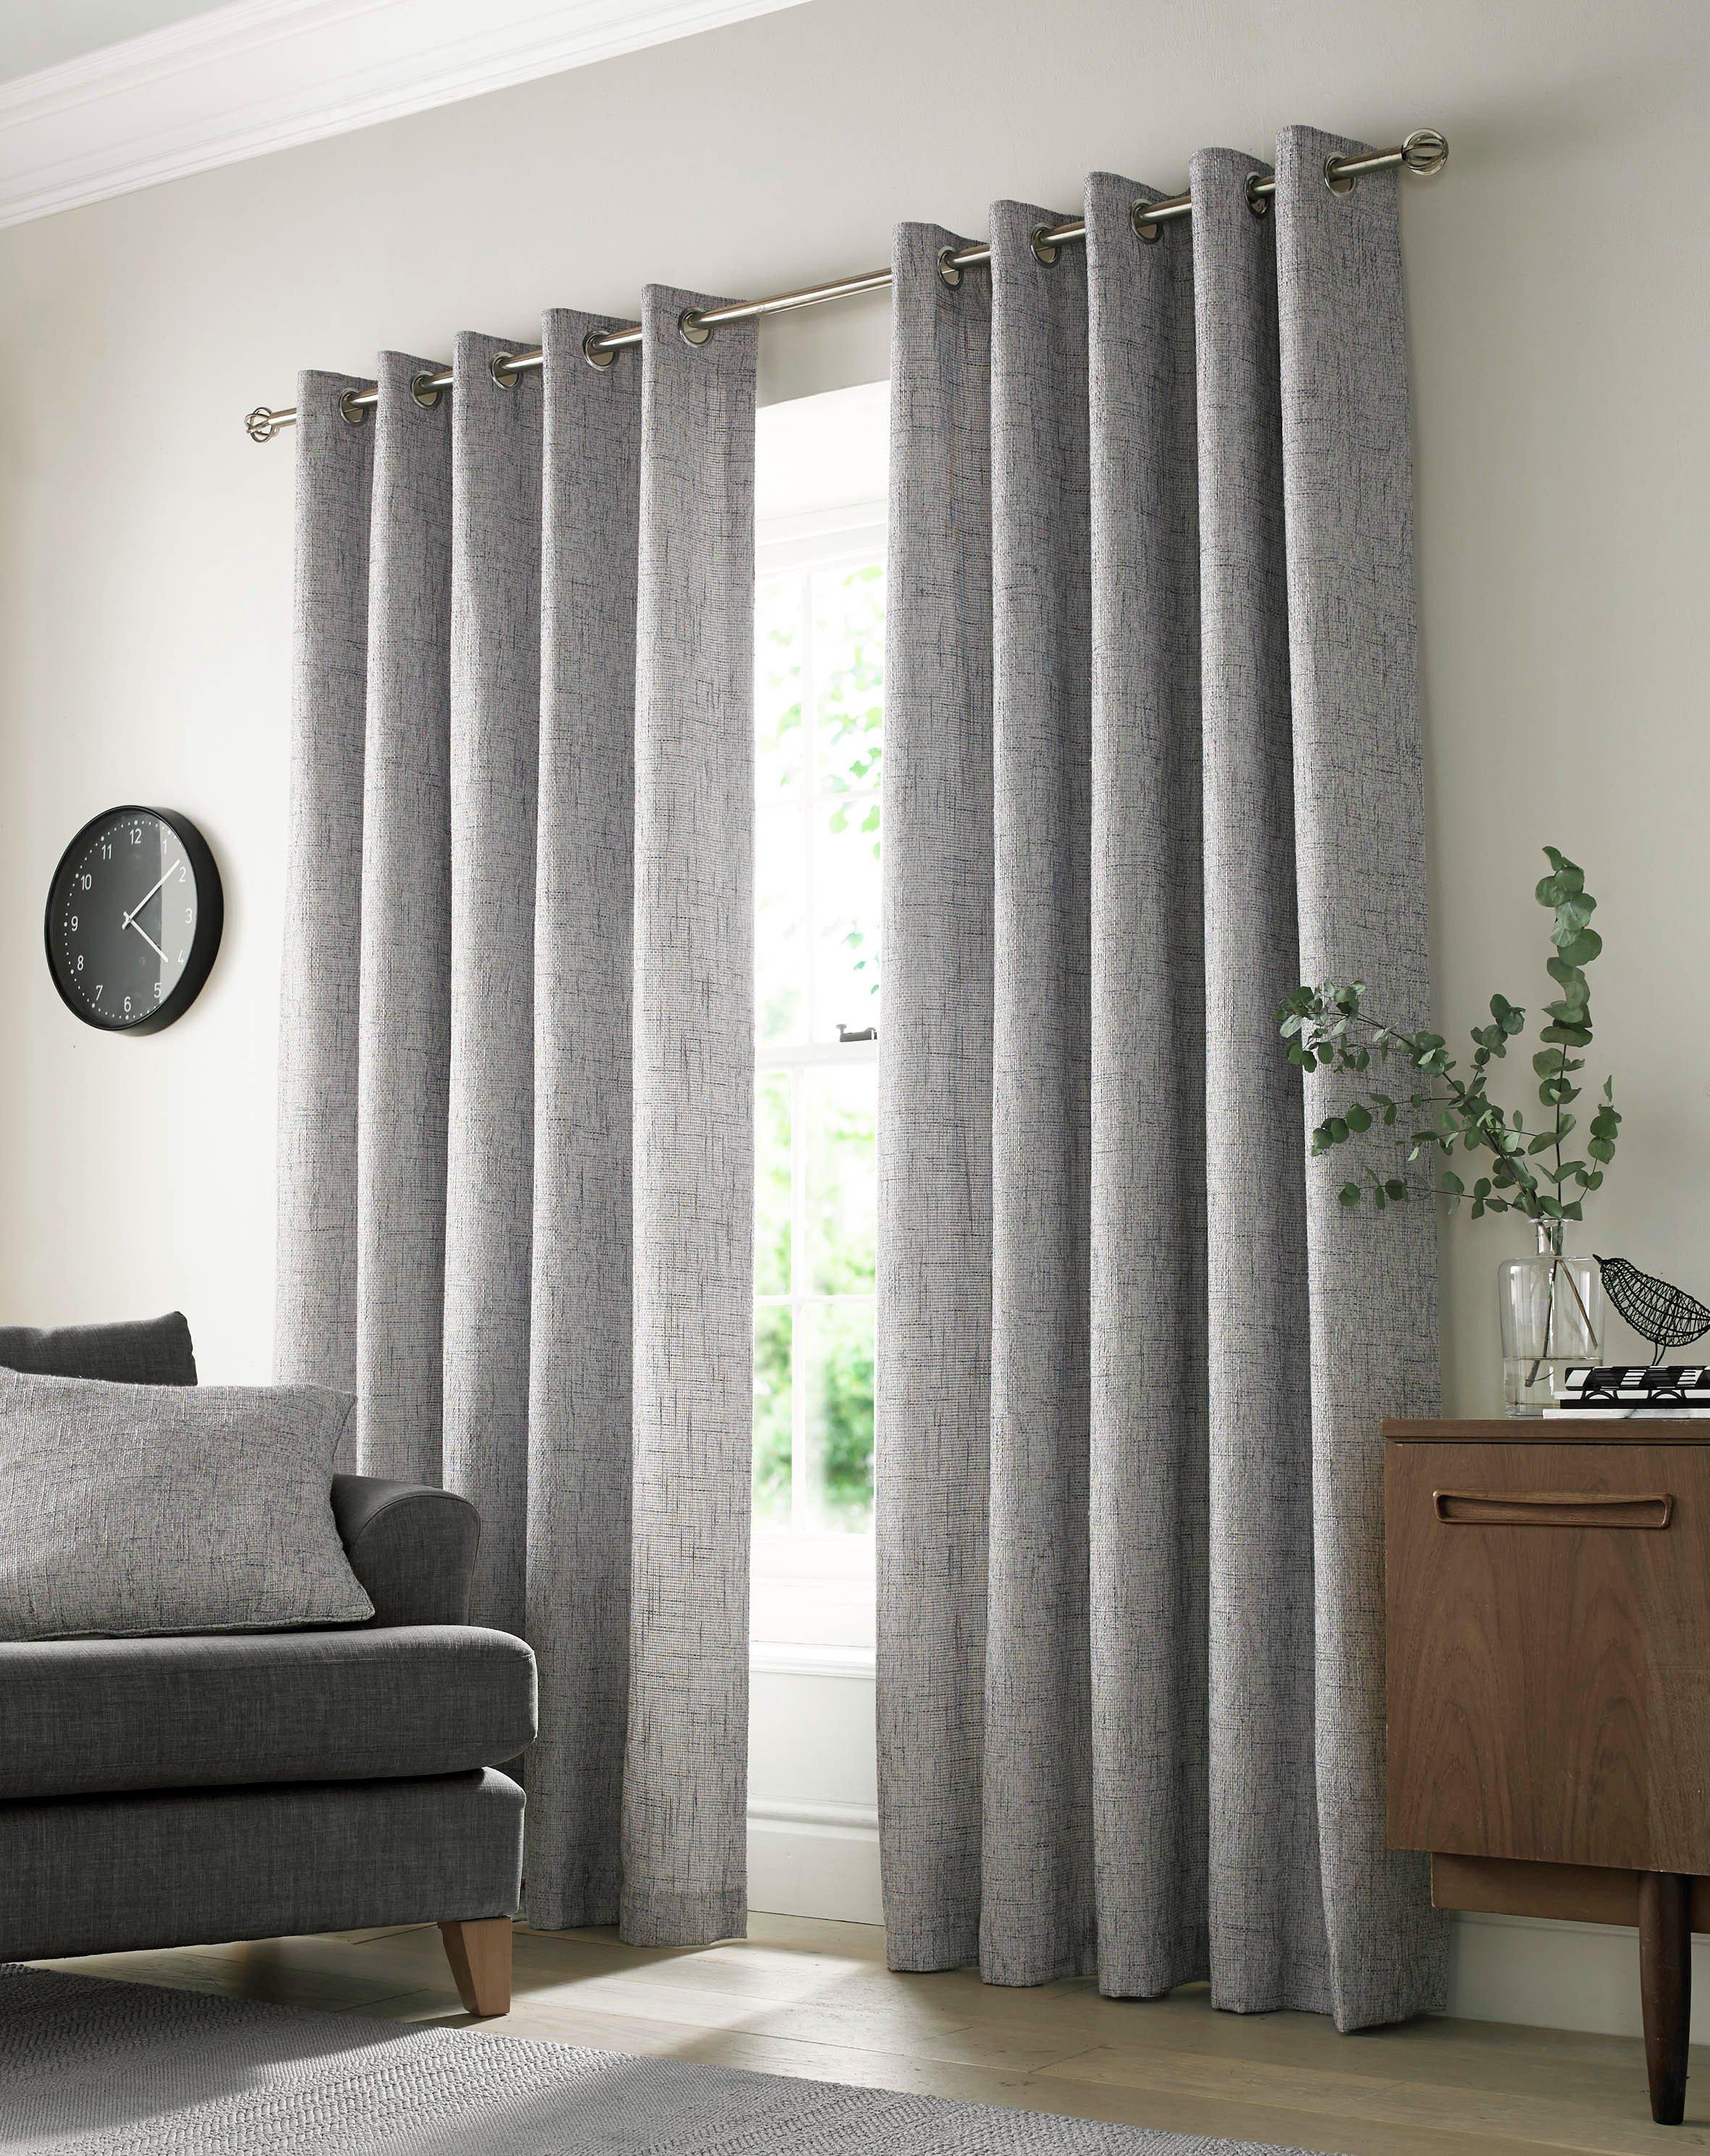 Academy Eyelet Curtains - 165x137cm - Grey.